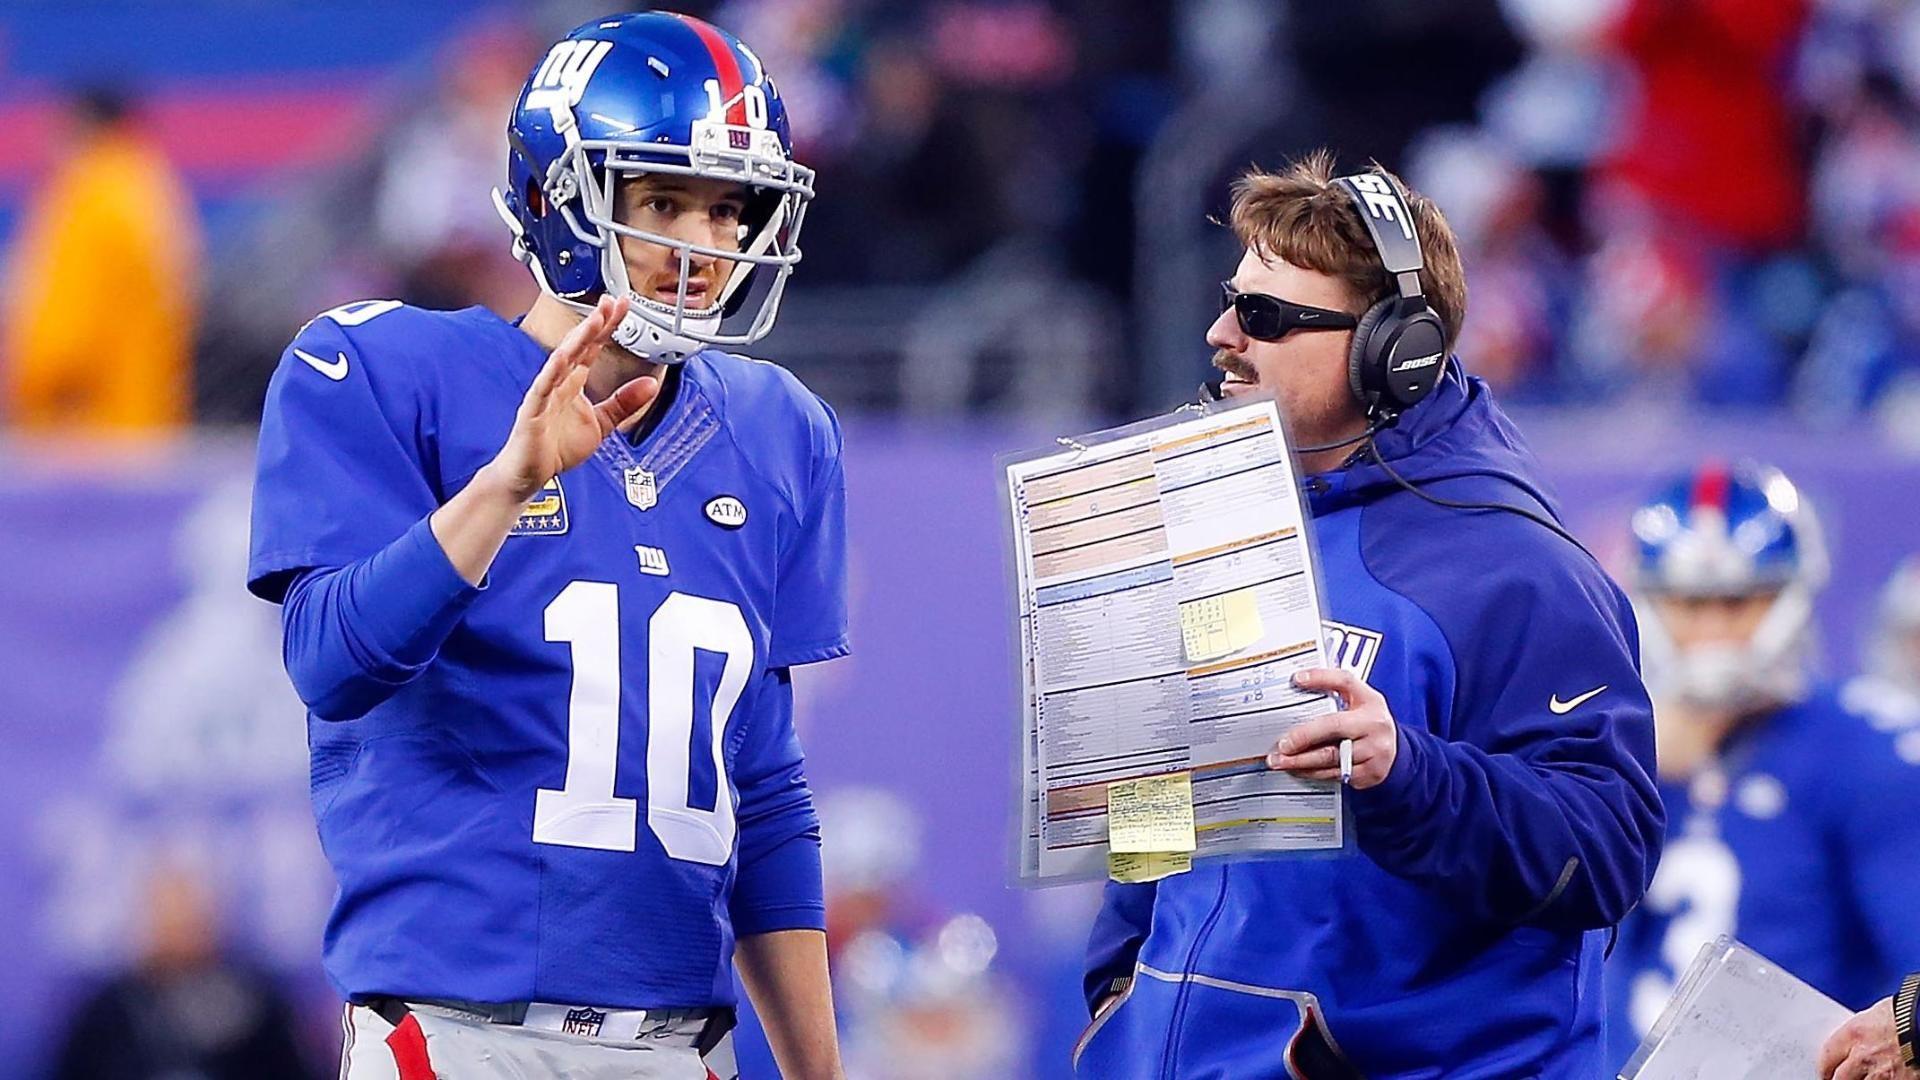 Eli a factor in McAdoo hiring